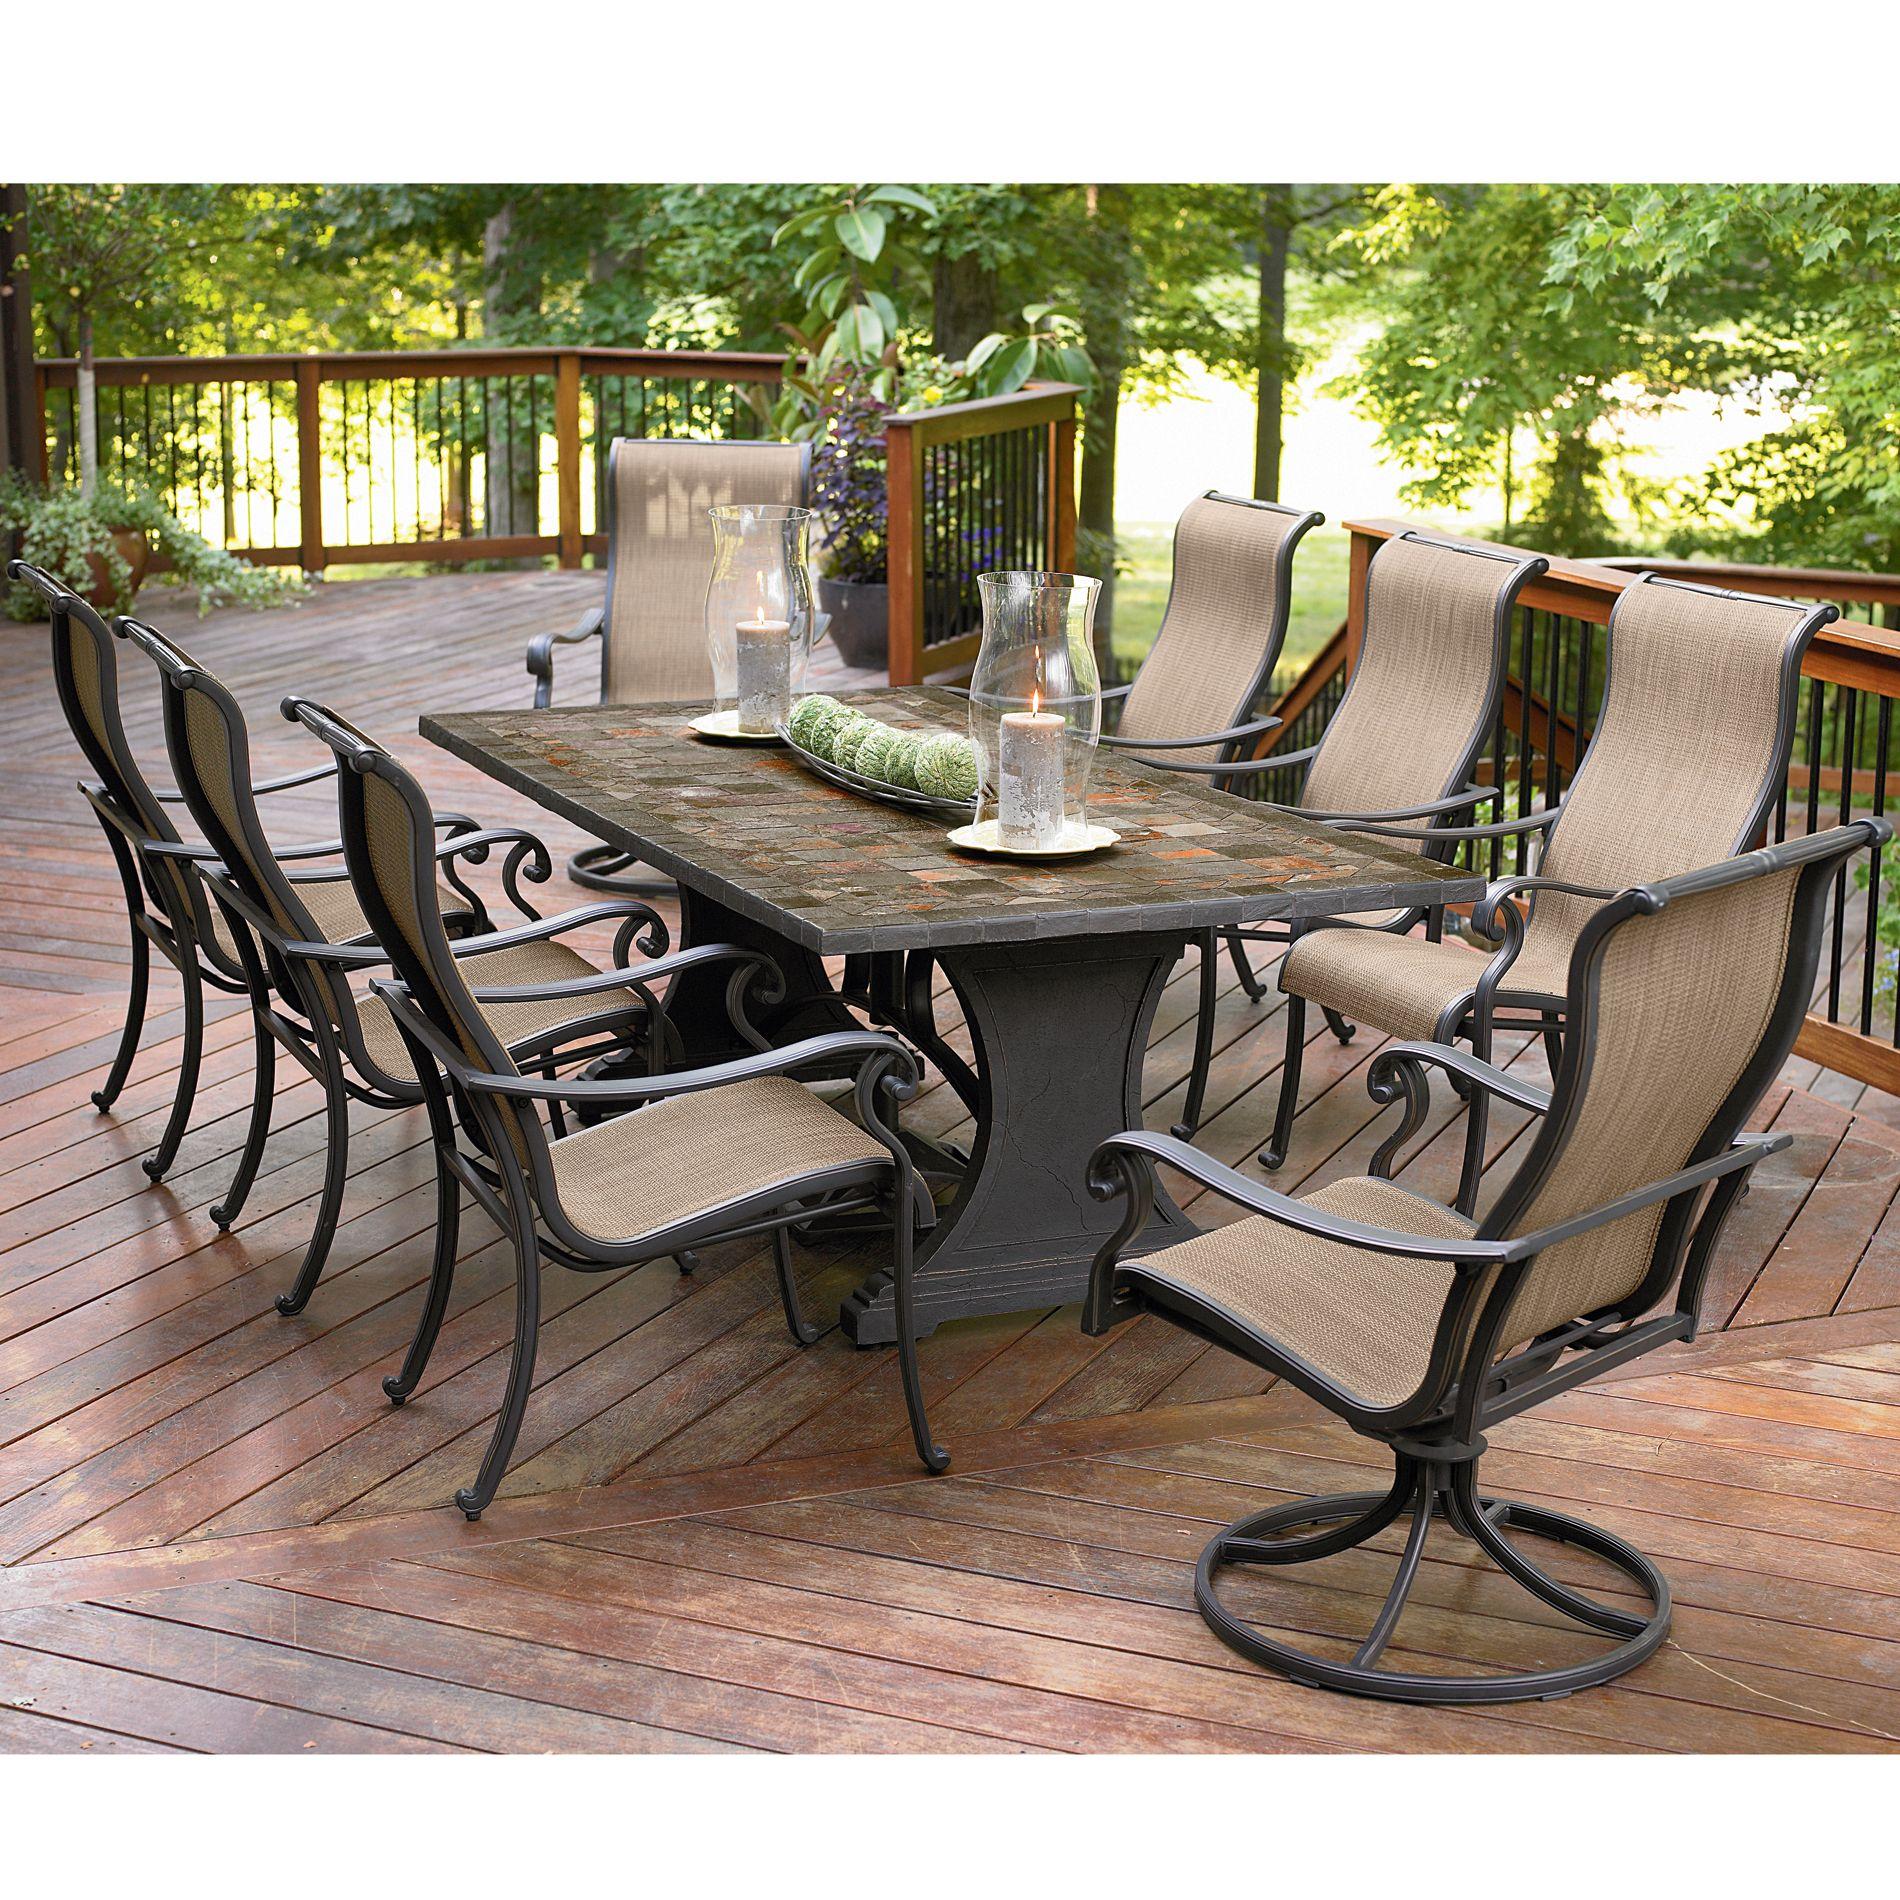 Best Agio International Panorama 9 Pc. Patio Dining Set - Sears agio outdoor patio furniture